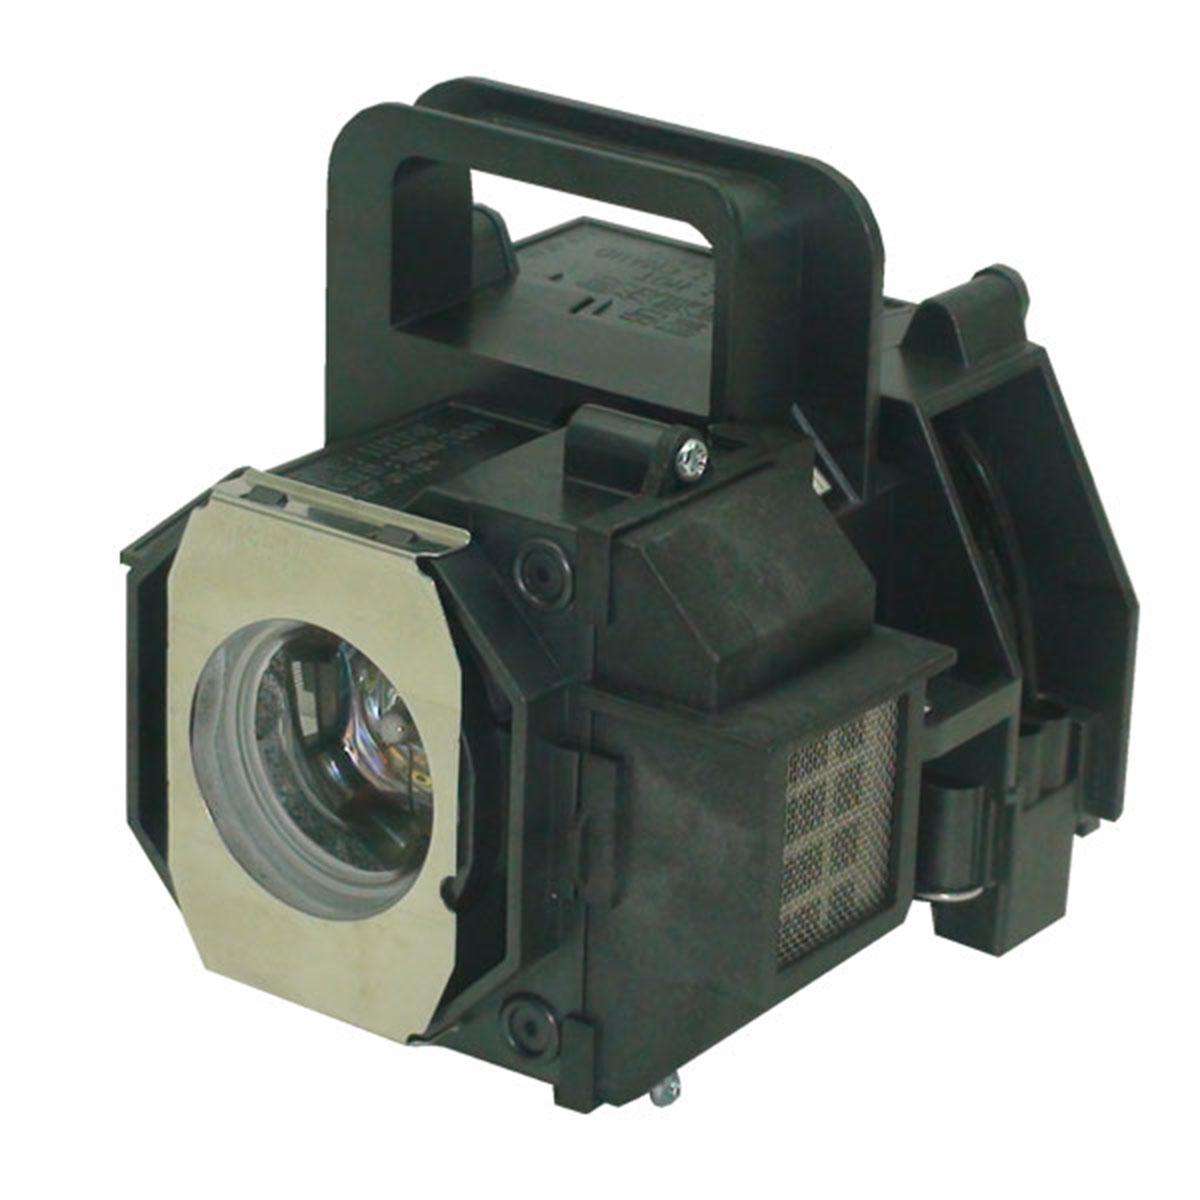 Lutema Platinum Bulb for Epson PowerLite Home Cinema 8700 UB Projector (Lamp Only) - image 5 de 5